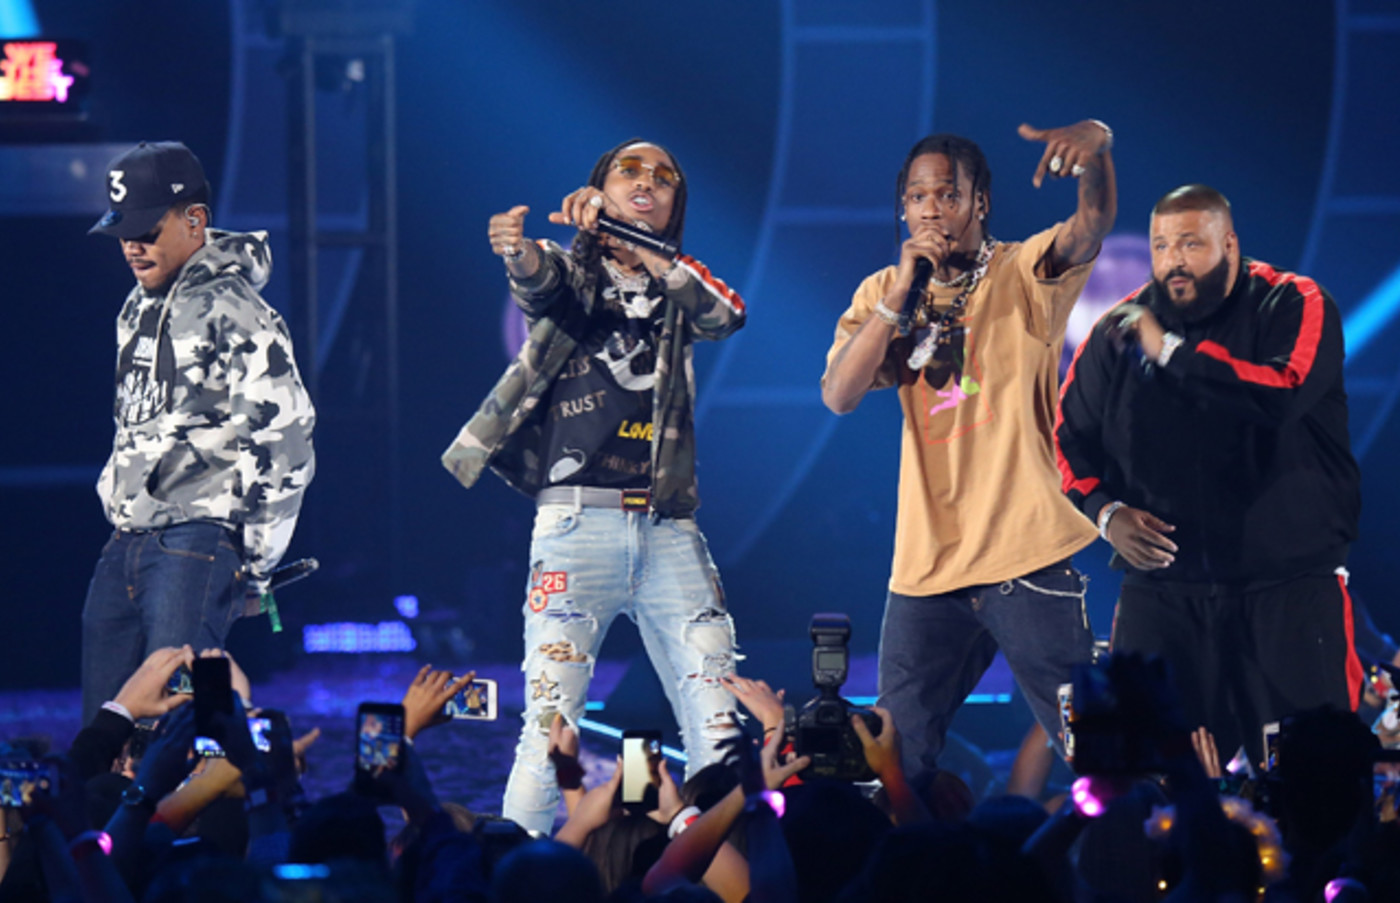 DJ Khaled, Travis Scott, Chance The Rapper and Quavo perform onstage